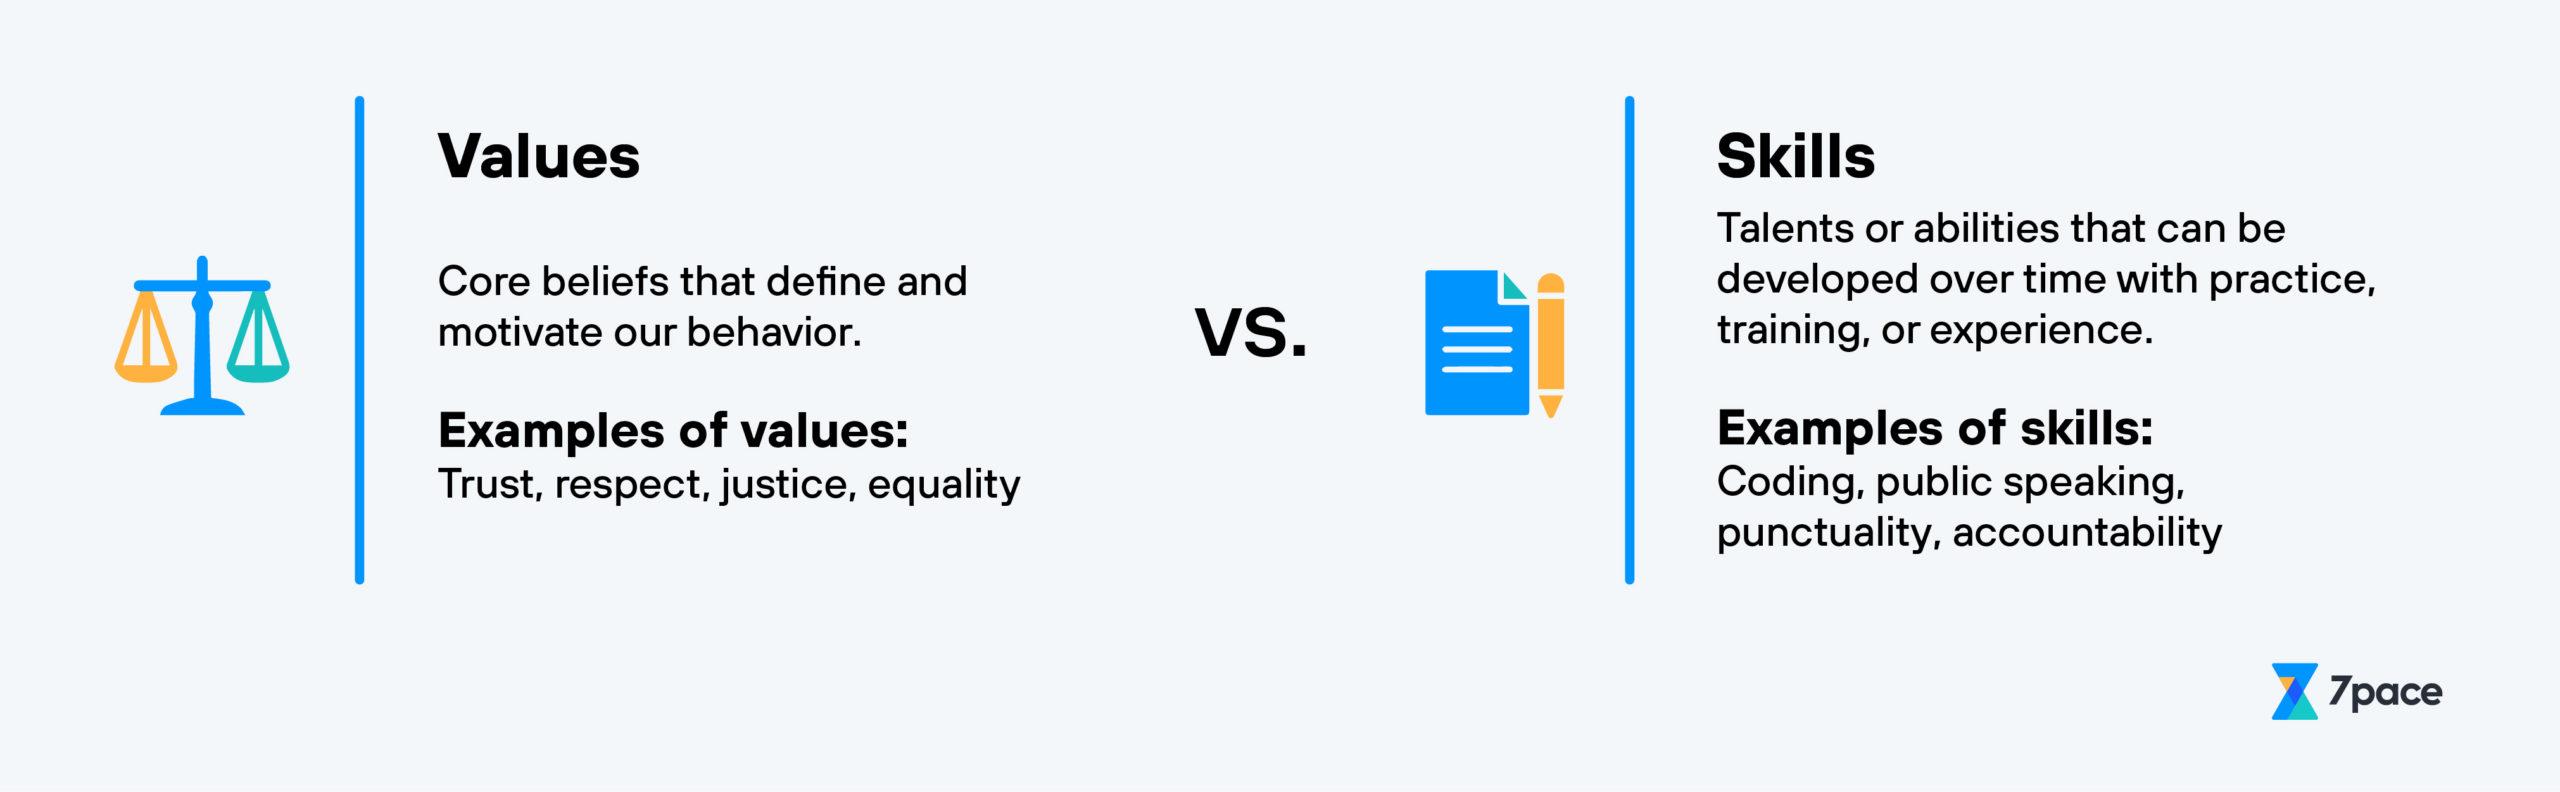 Accountability: Value or Skill?